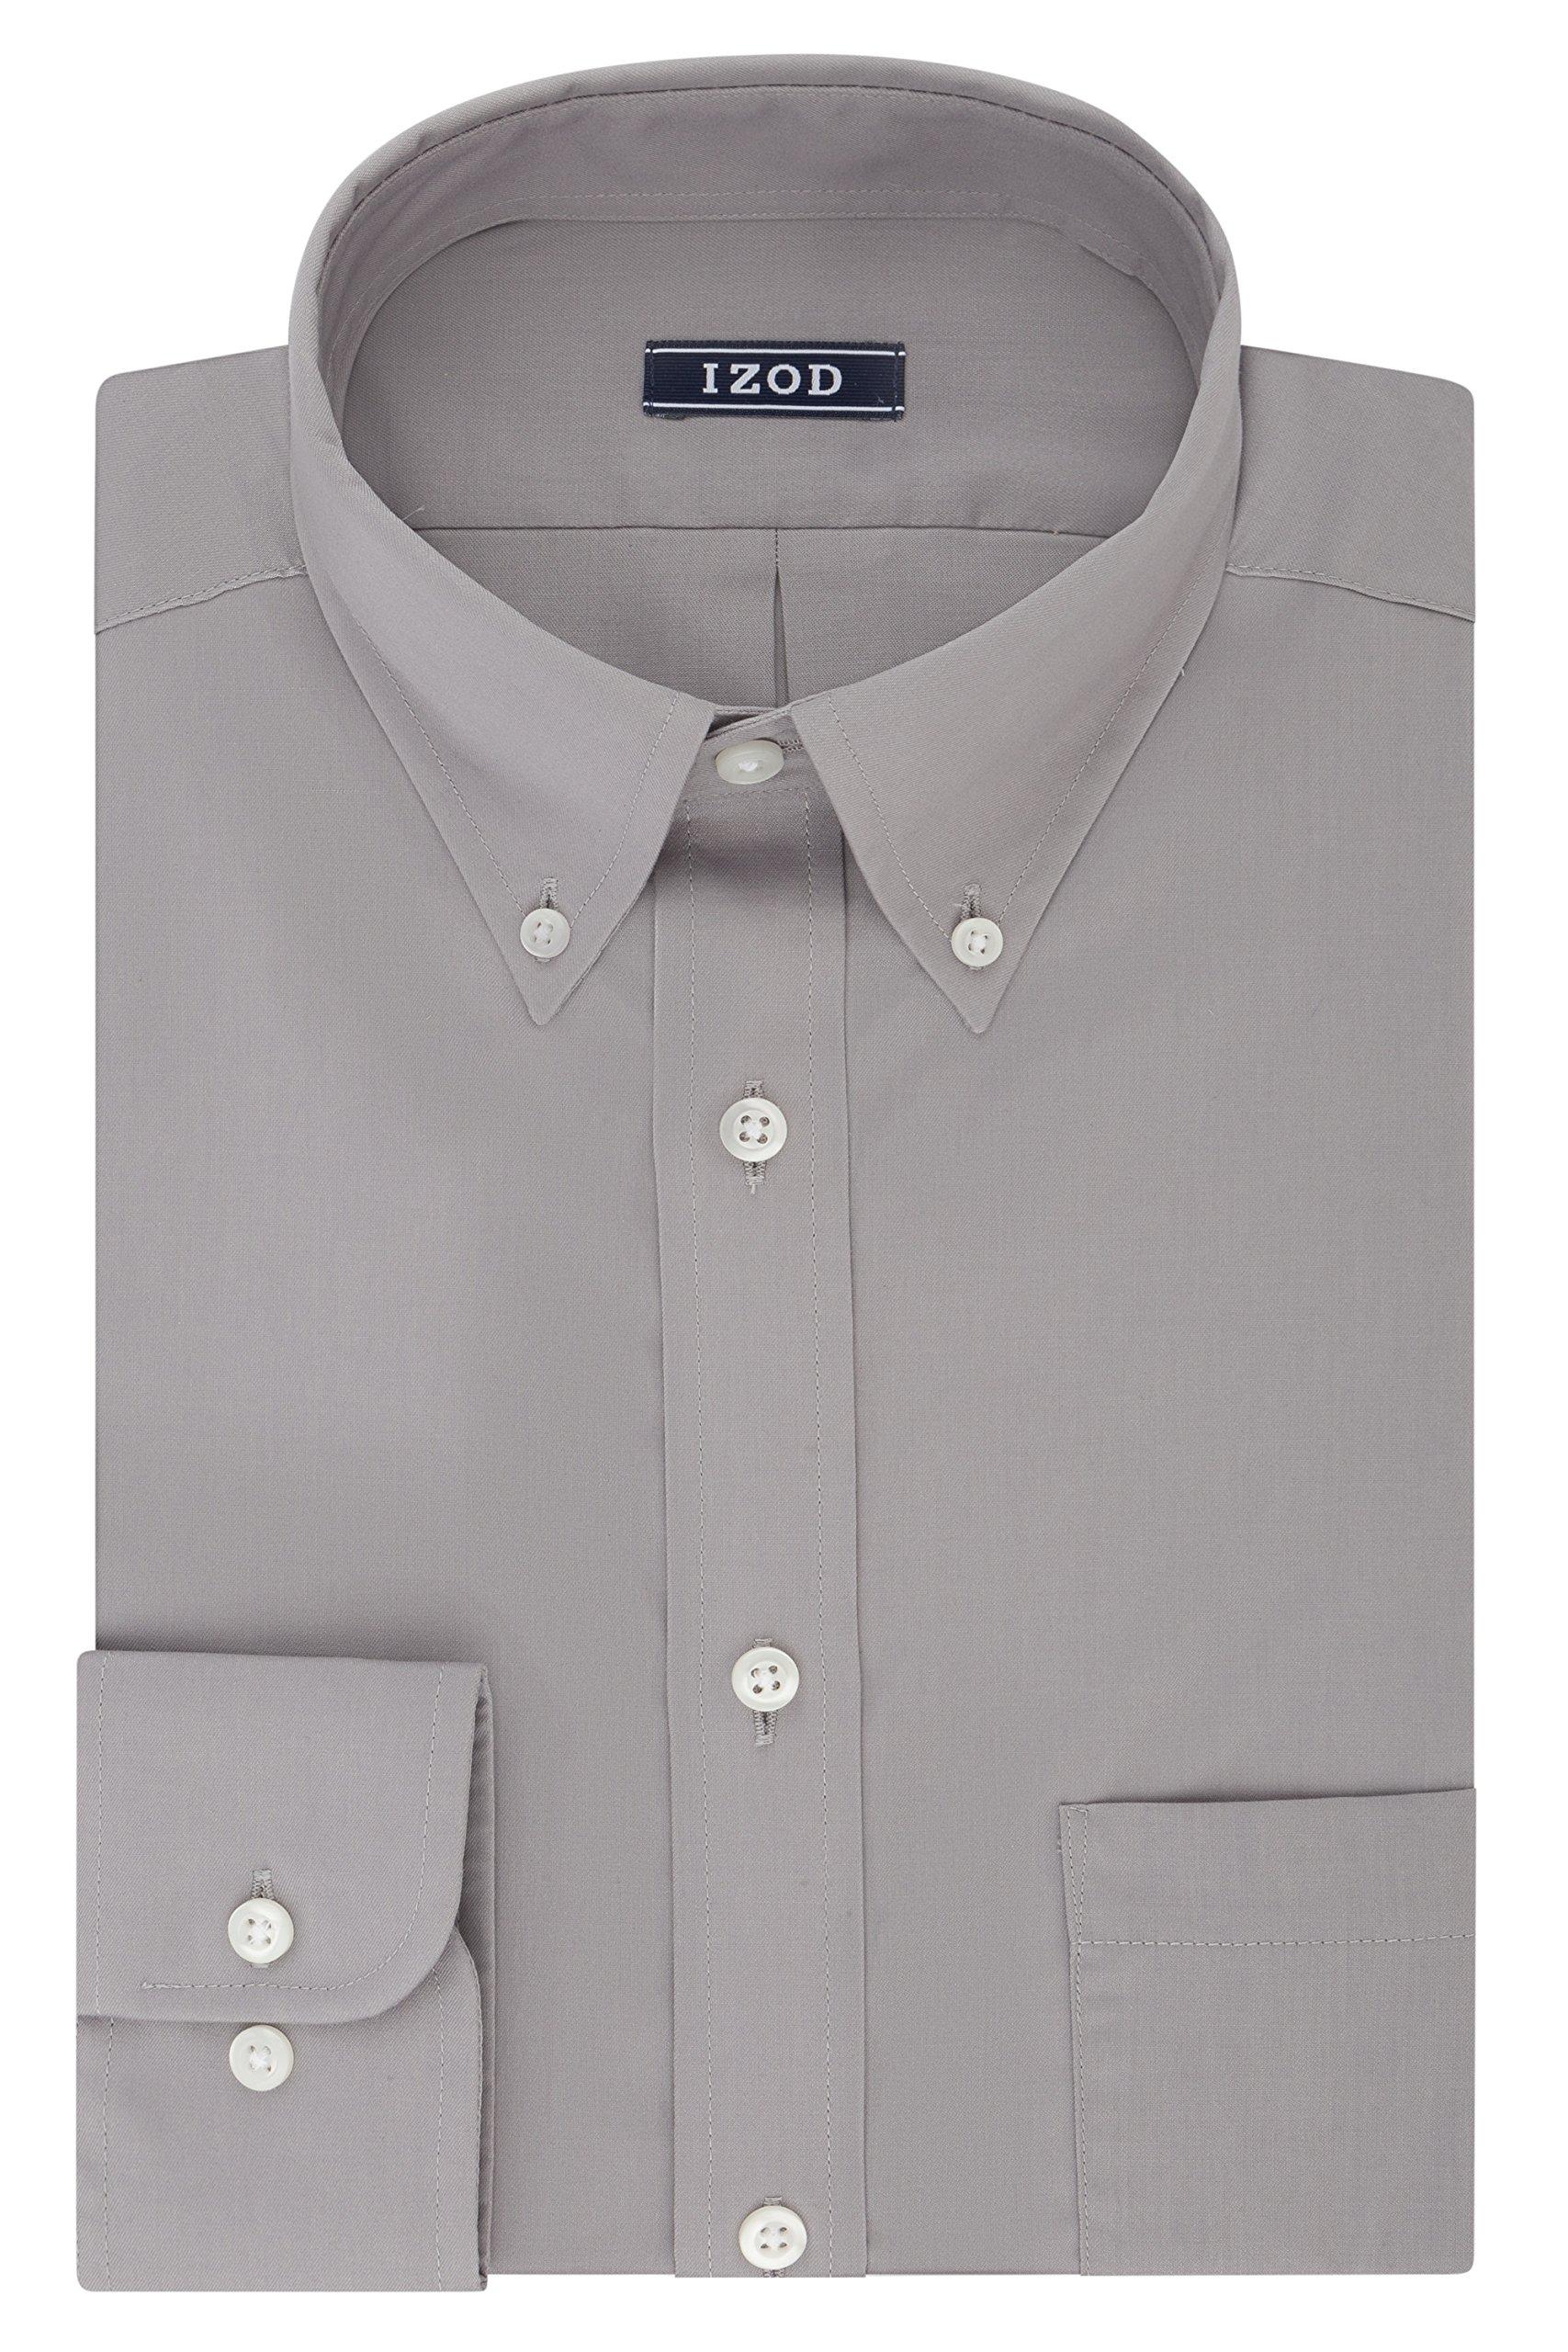 IZOD Men's Regular Fit Stretch Solid Buttondown Collar Dress Shirt, Slate, 17''-17.5'' Neck 32''-33'' Sleeve